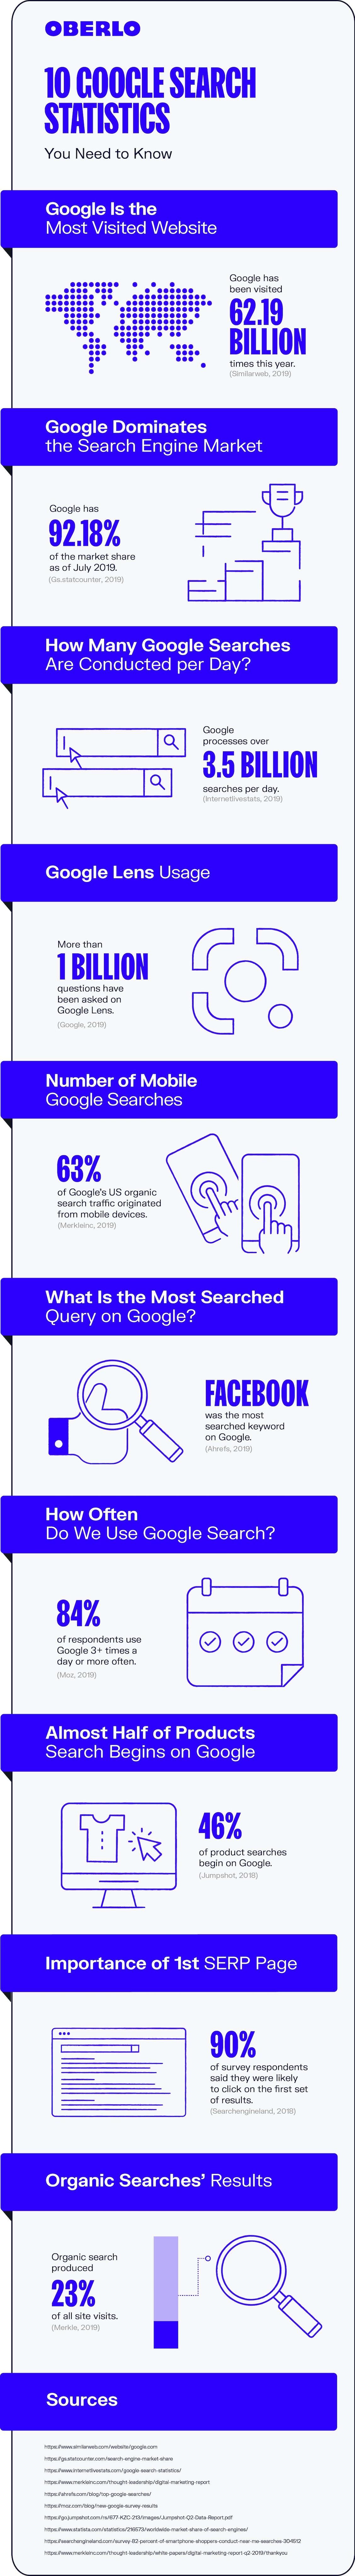 Google Search Statistics 2020